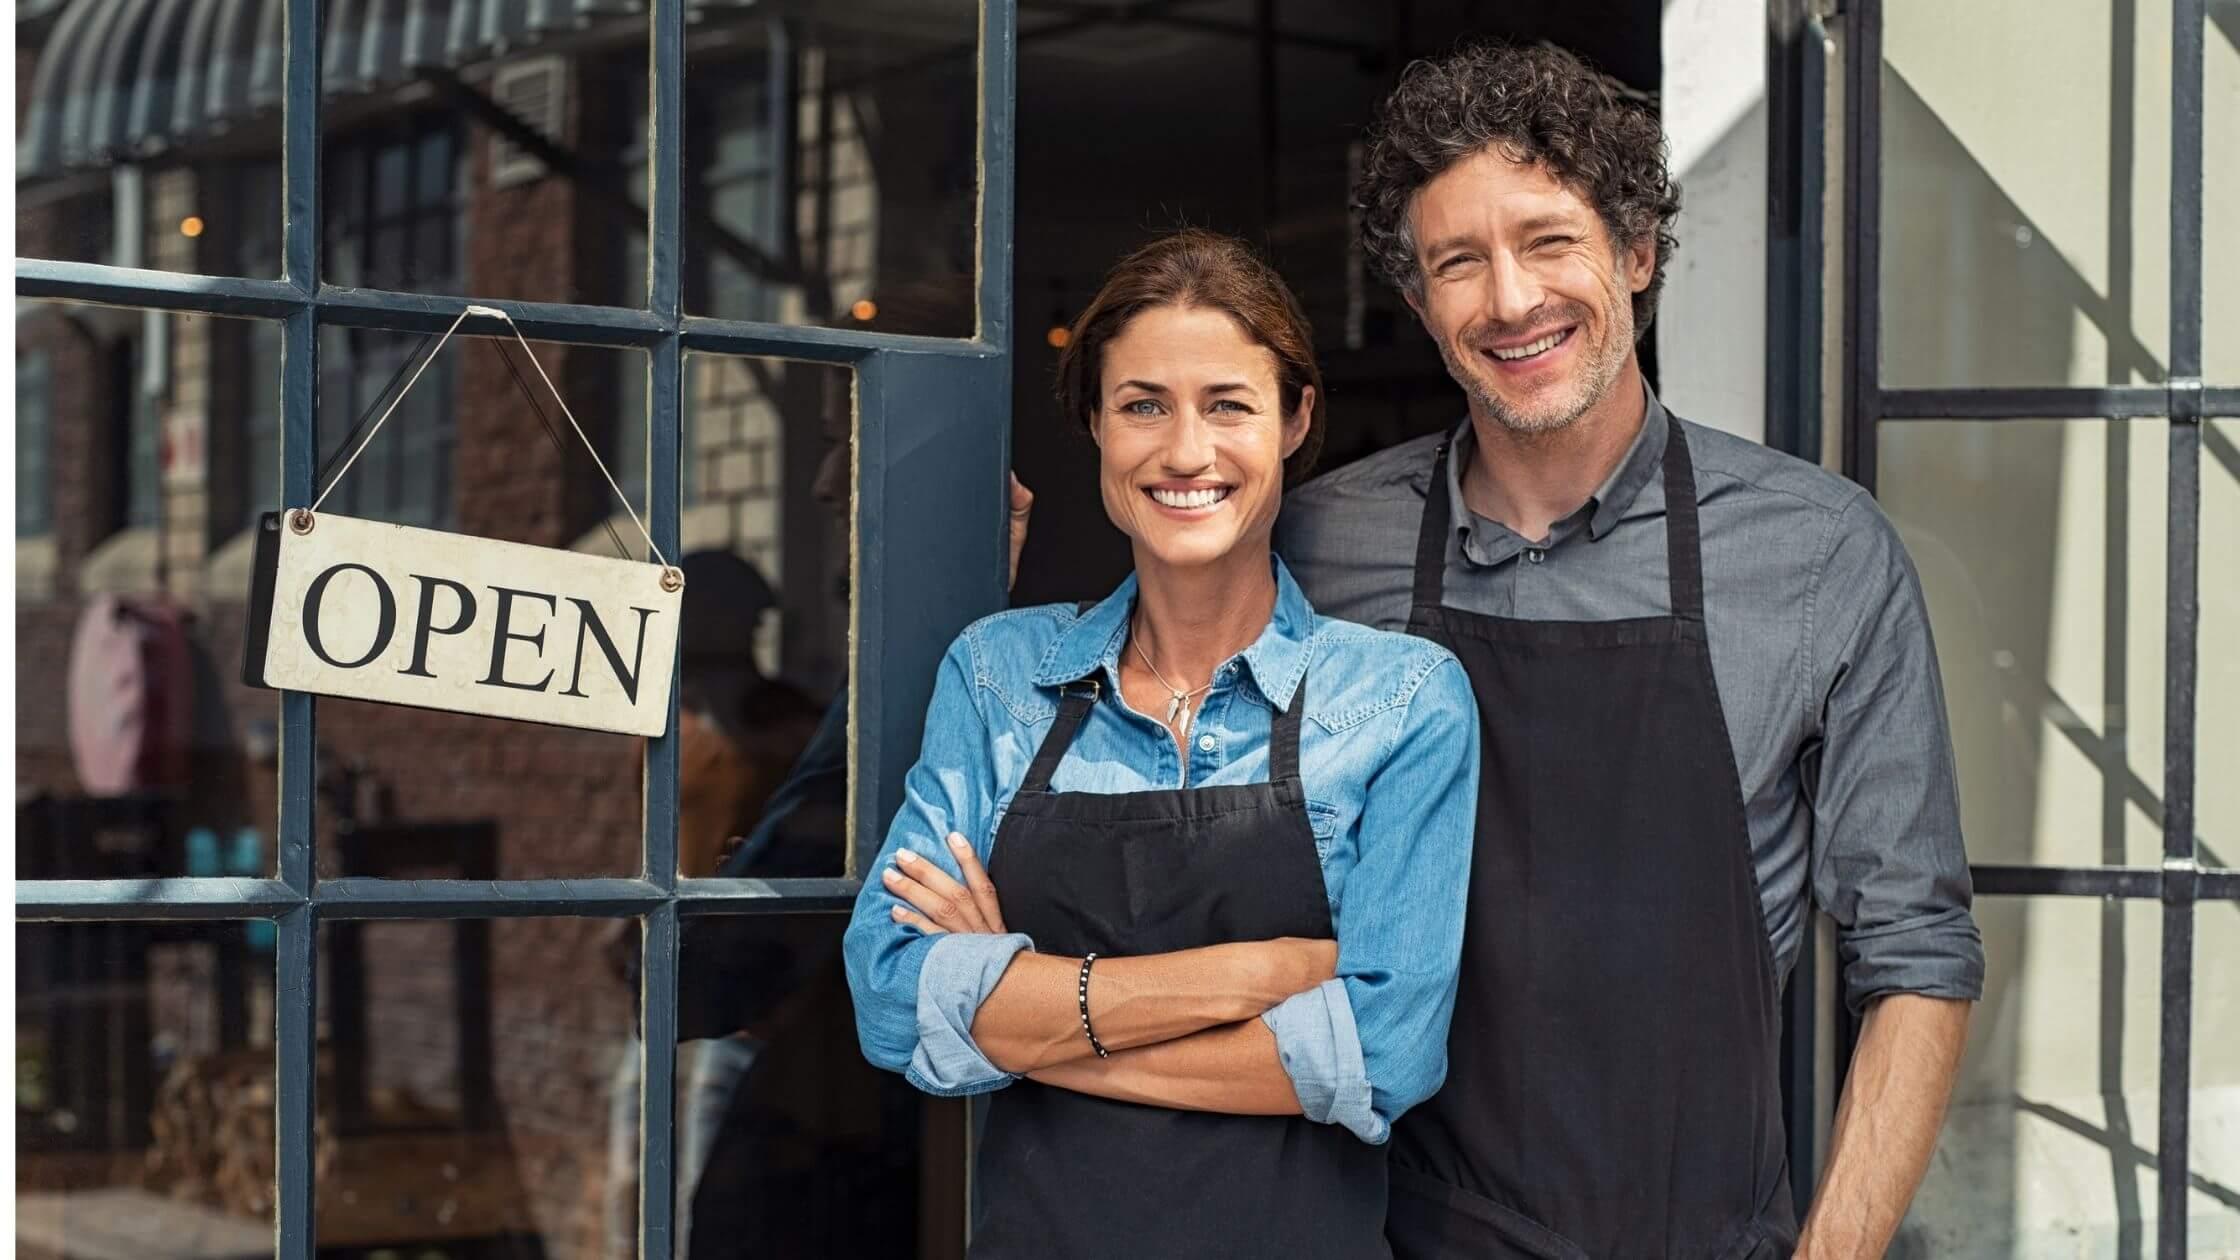 digital marketing strategies for small business By HexRow Go Digital